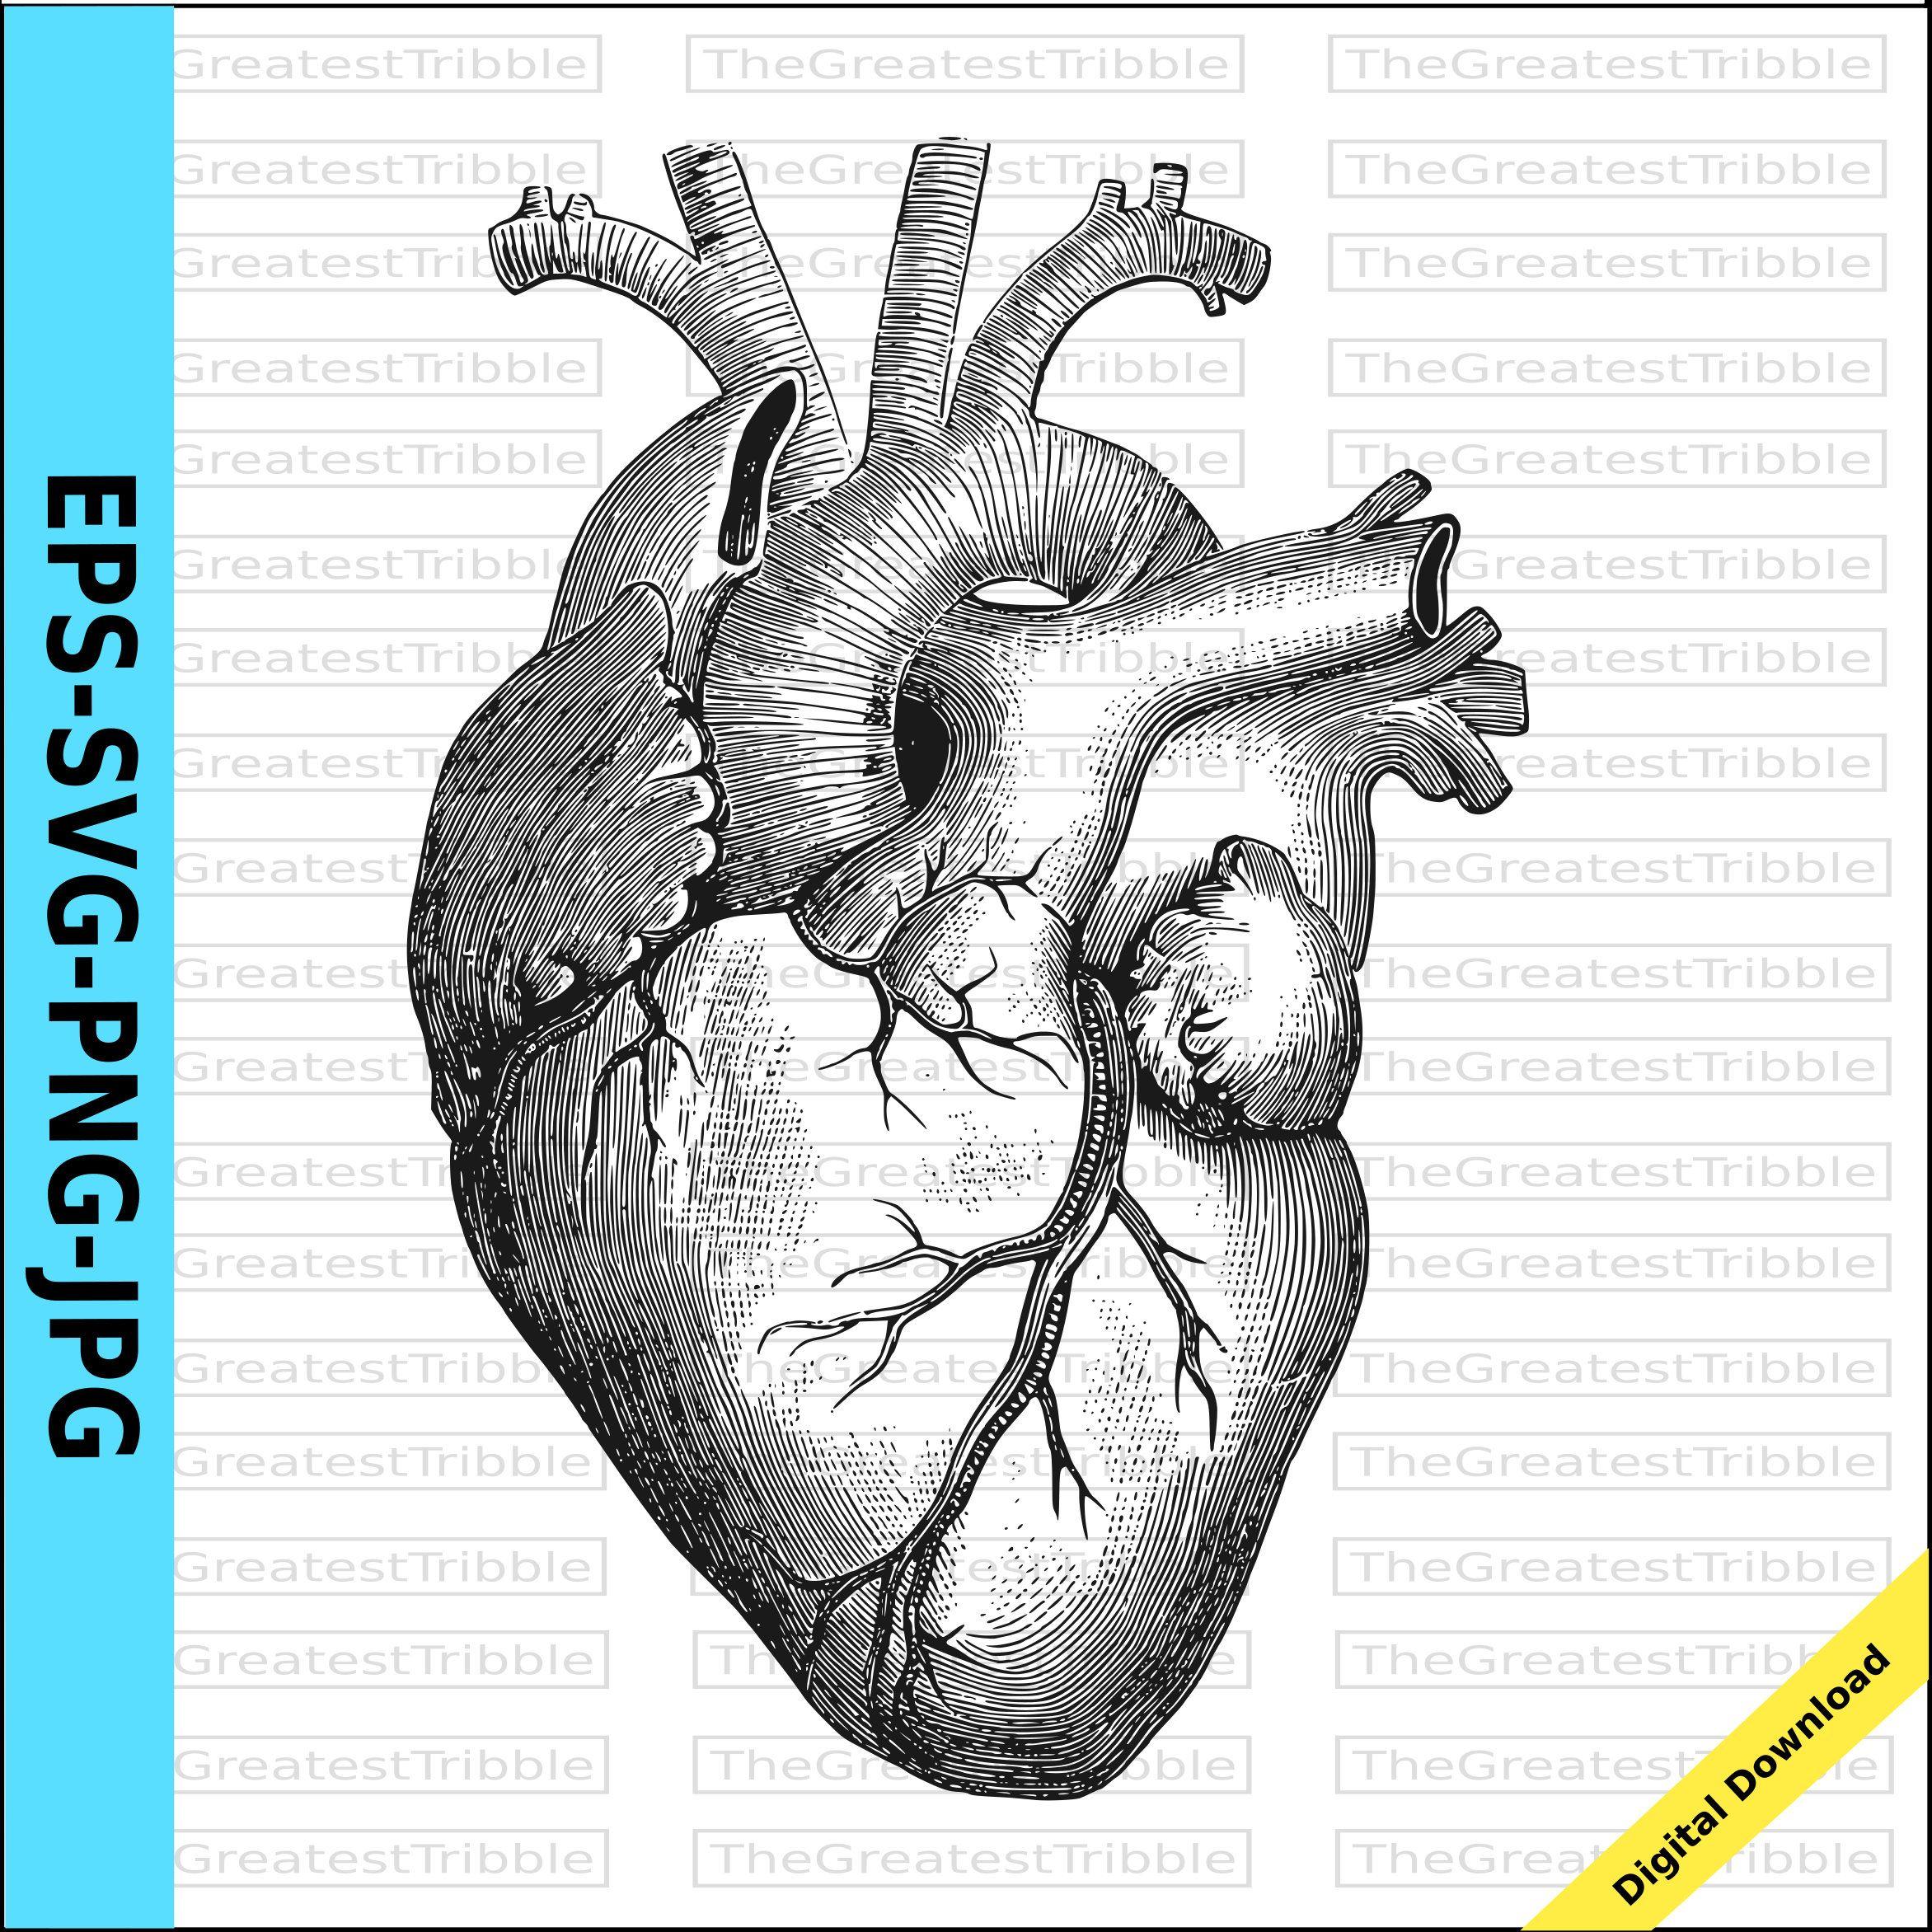 Anatomical Heart Clip Art Eps Svg Png Jpg Valentine Heart Digital Anatomical Heart Printable Clip Art Morbid Valent In 2021 Heart Clip Art Dinosaur Silhouette Clip Art